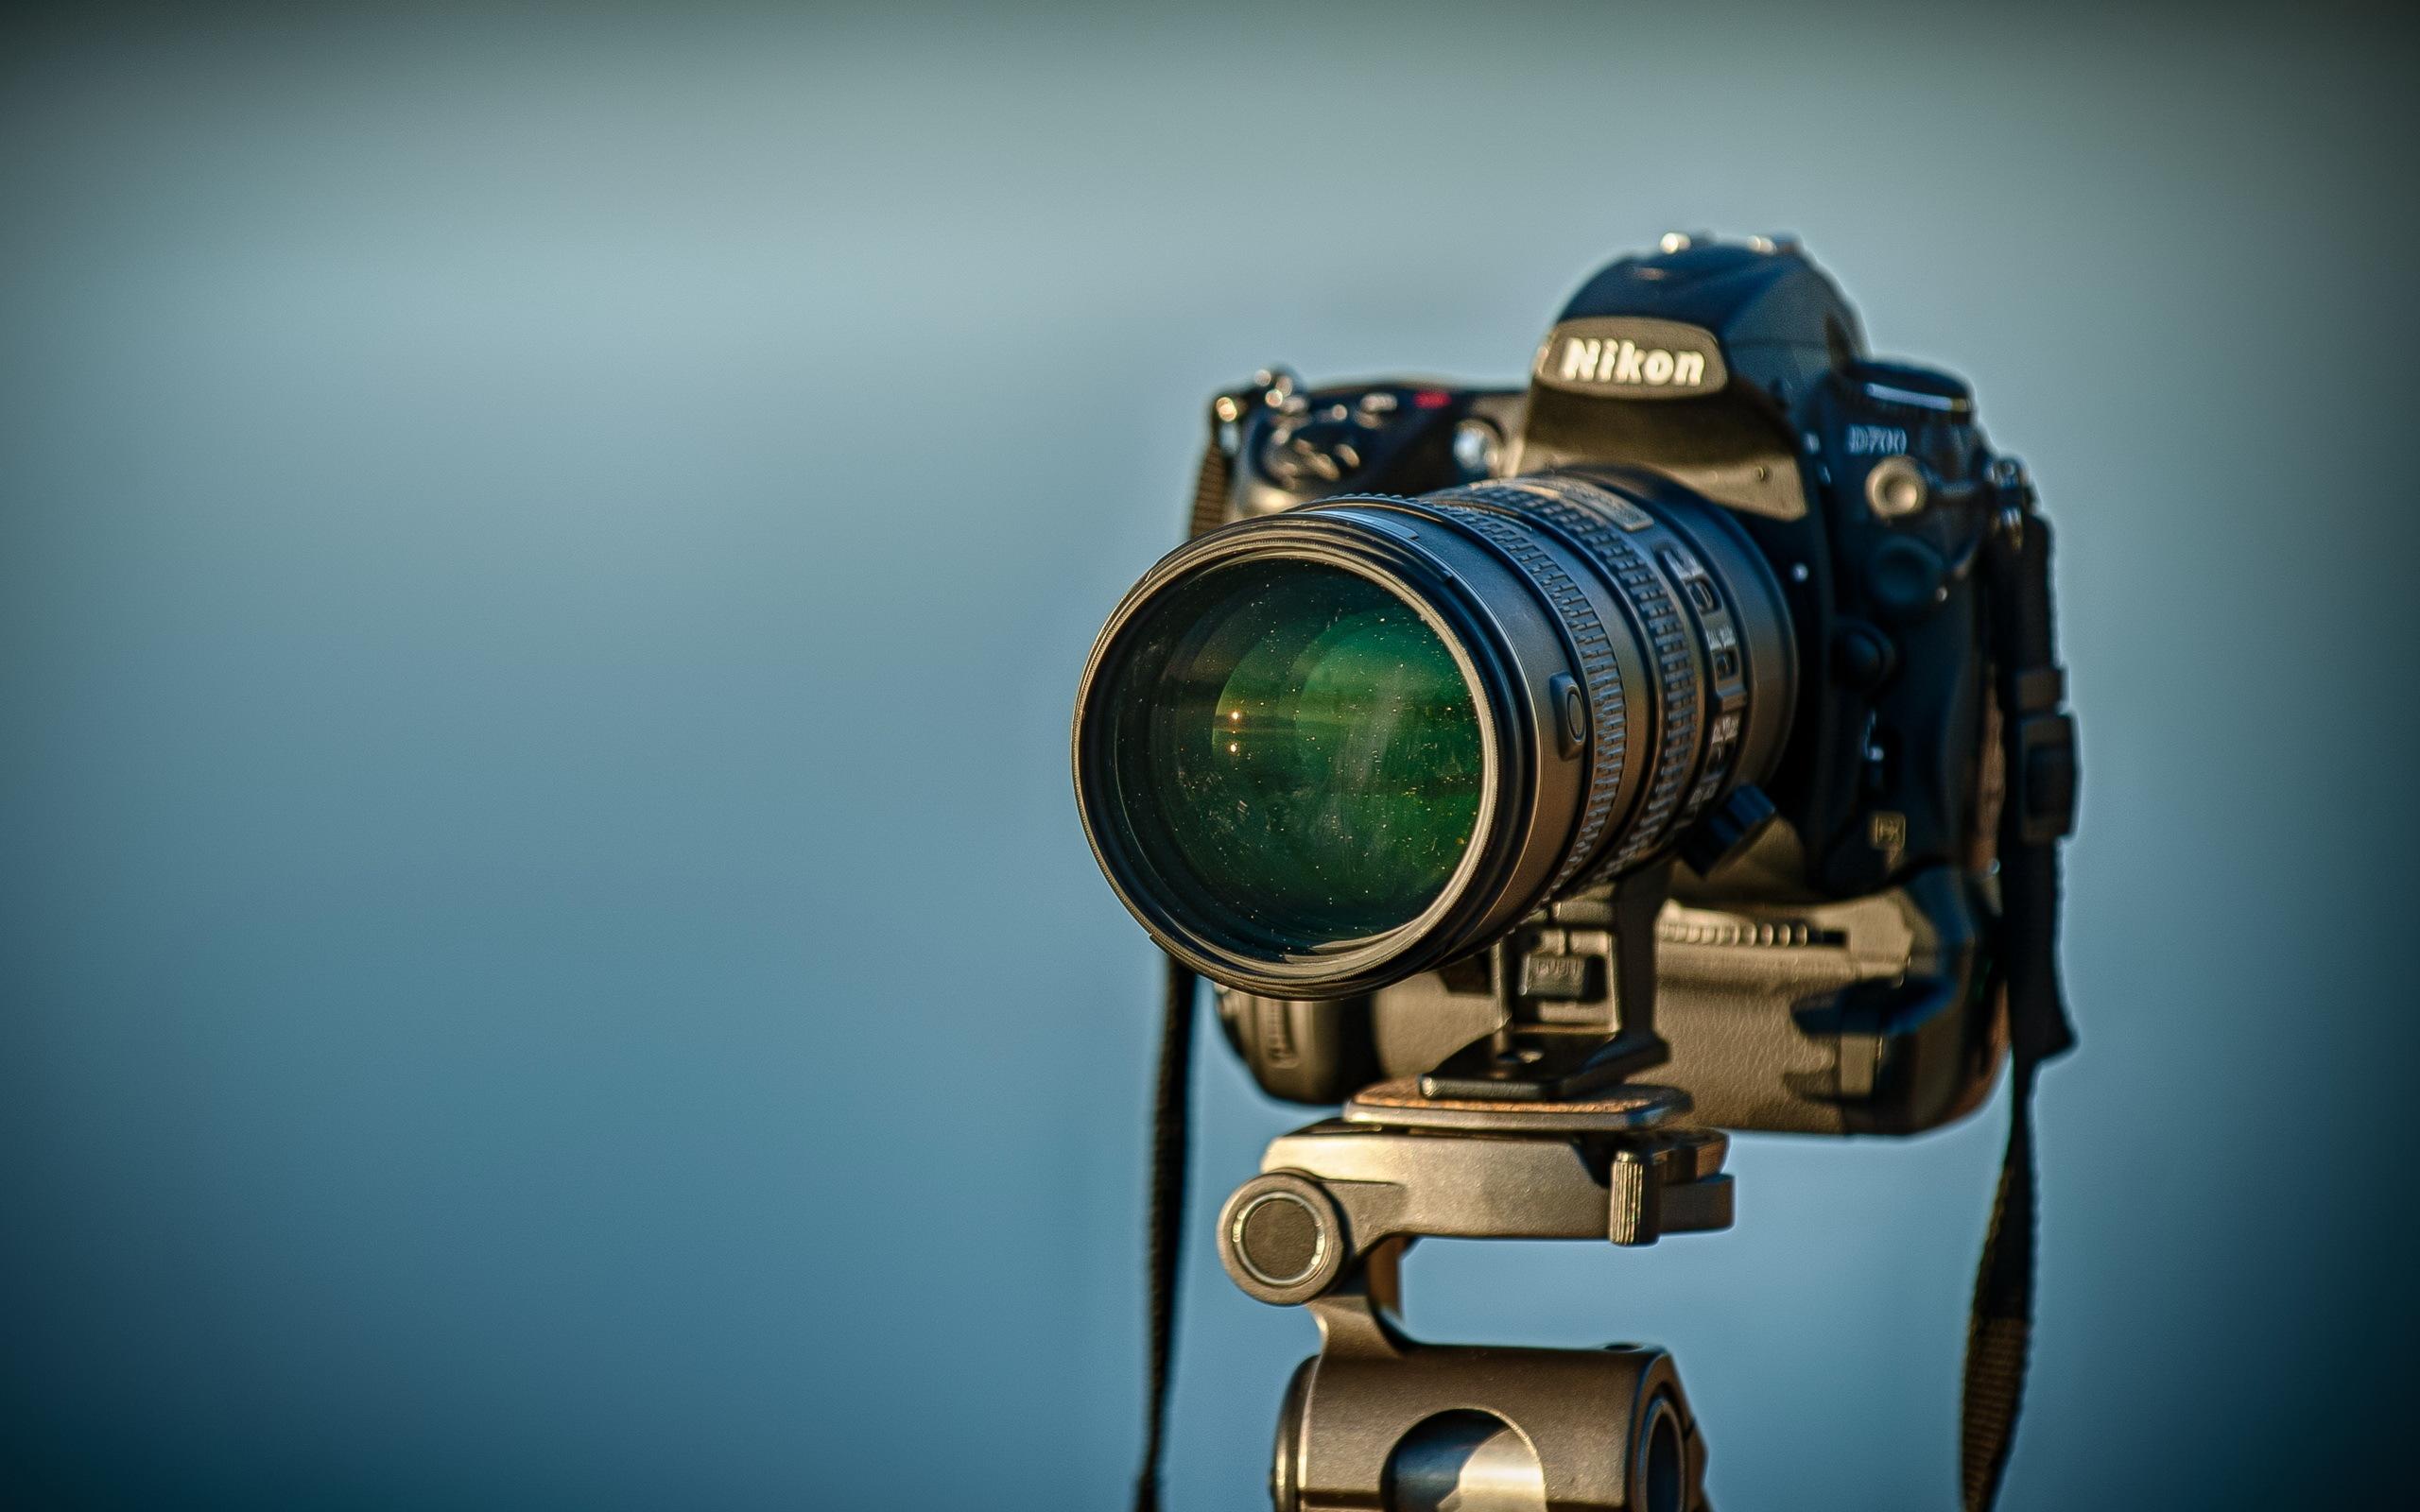 Nikon D700 Hd Wallpaper Background Image 2560x1600 Id409963